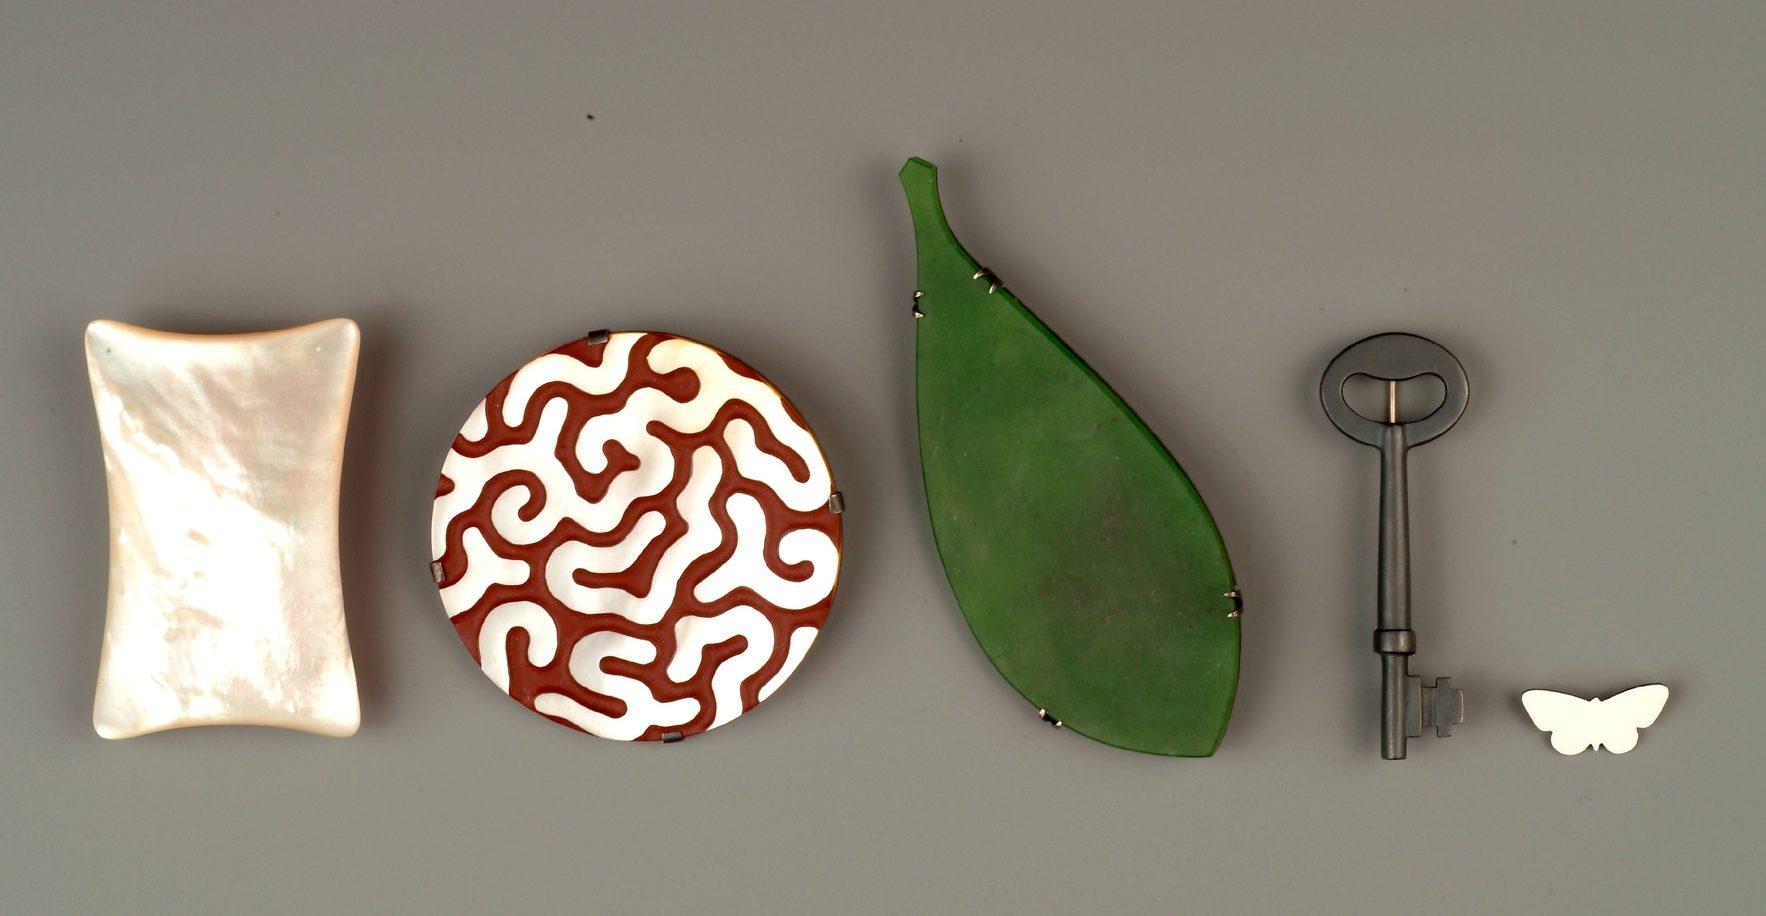 Warwick Freeman, broches: Pillow, 1992, Carved Brain, 2001, Karuka Leaf, 1997, Key, 1998, White Buterfly, 1999. Foto met dank aan Stichting Françoise van den Bosch©